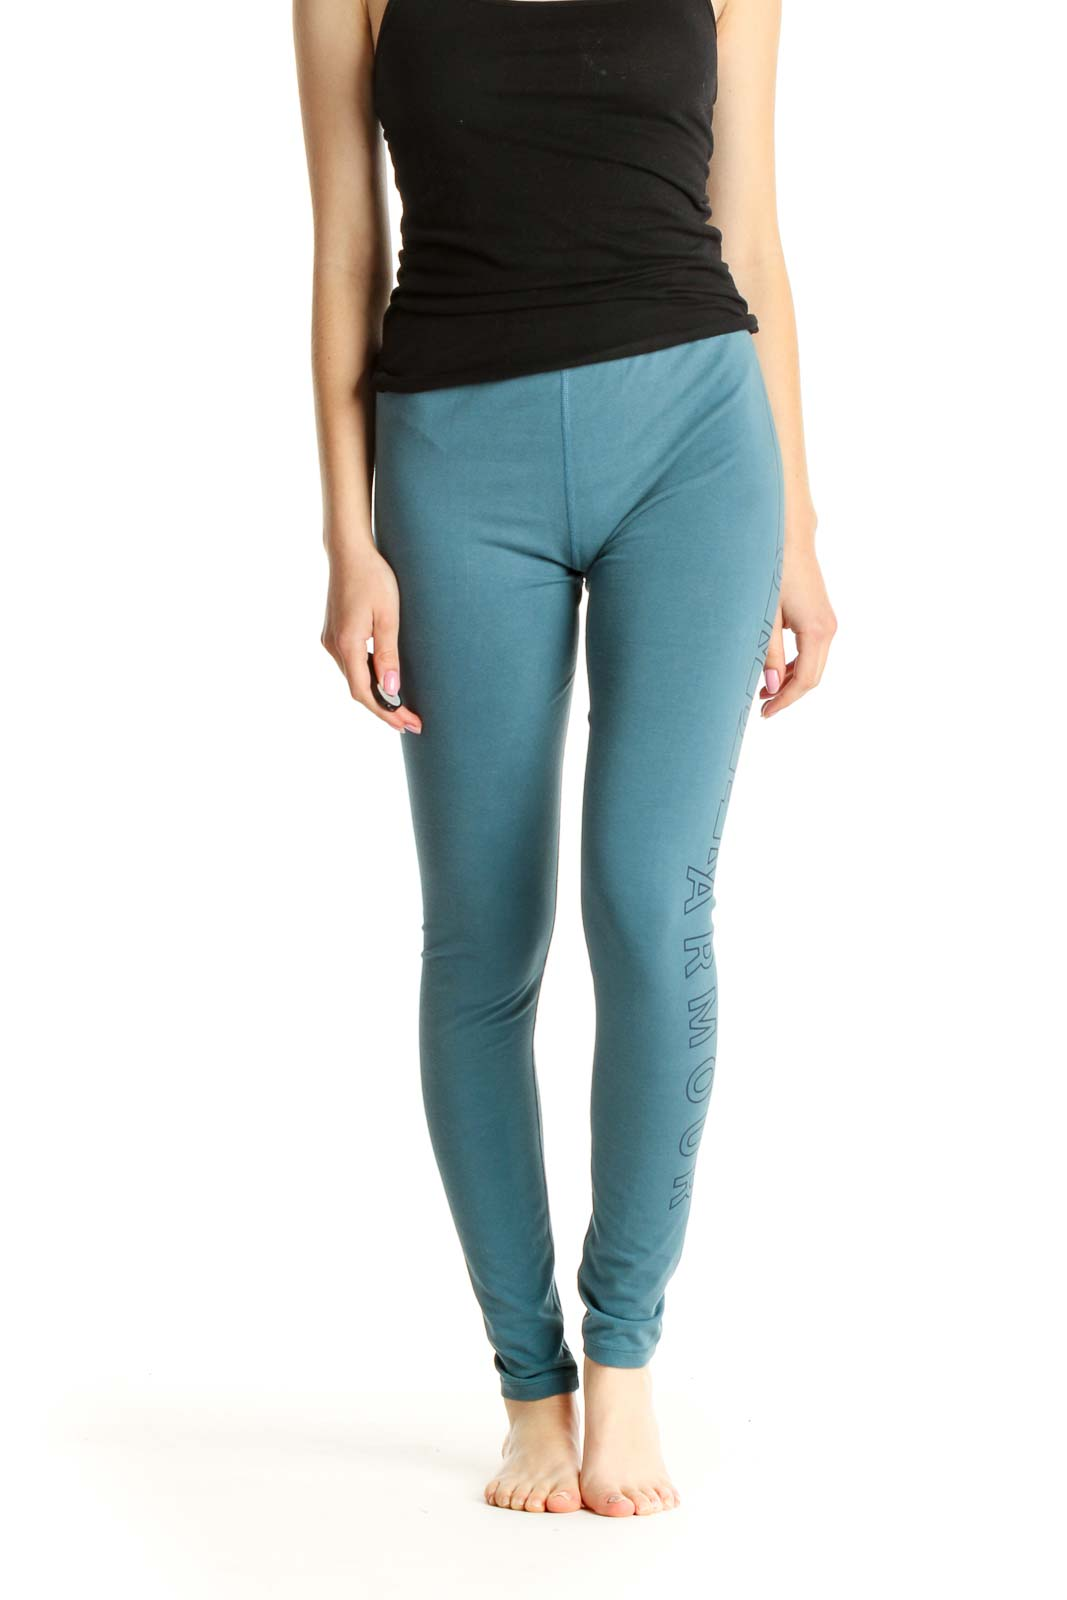 Blue Activewear Leggings Front